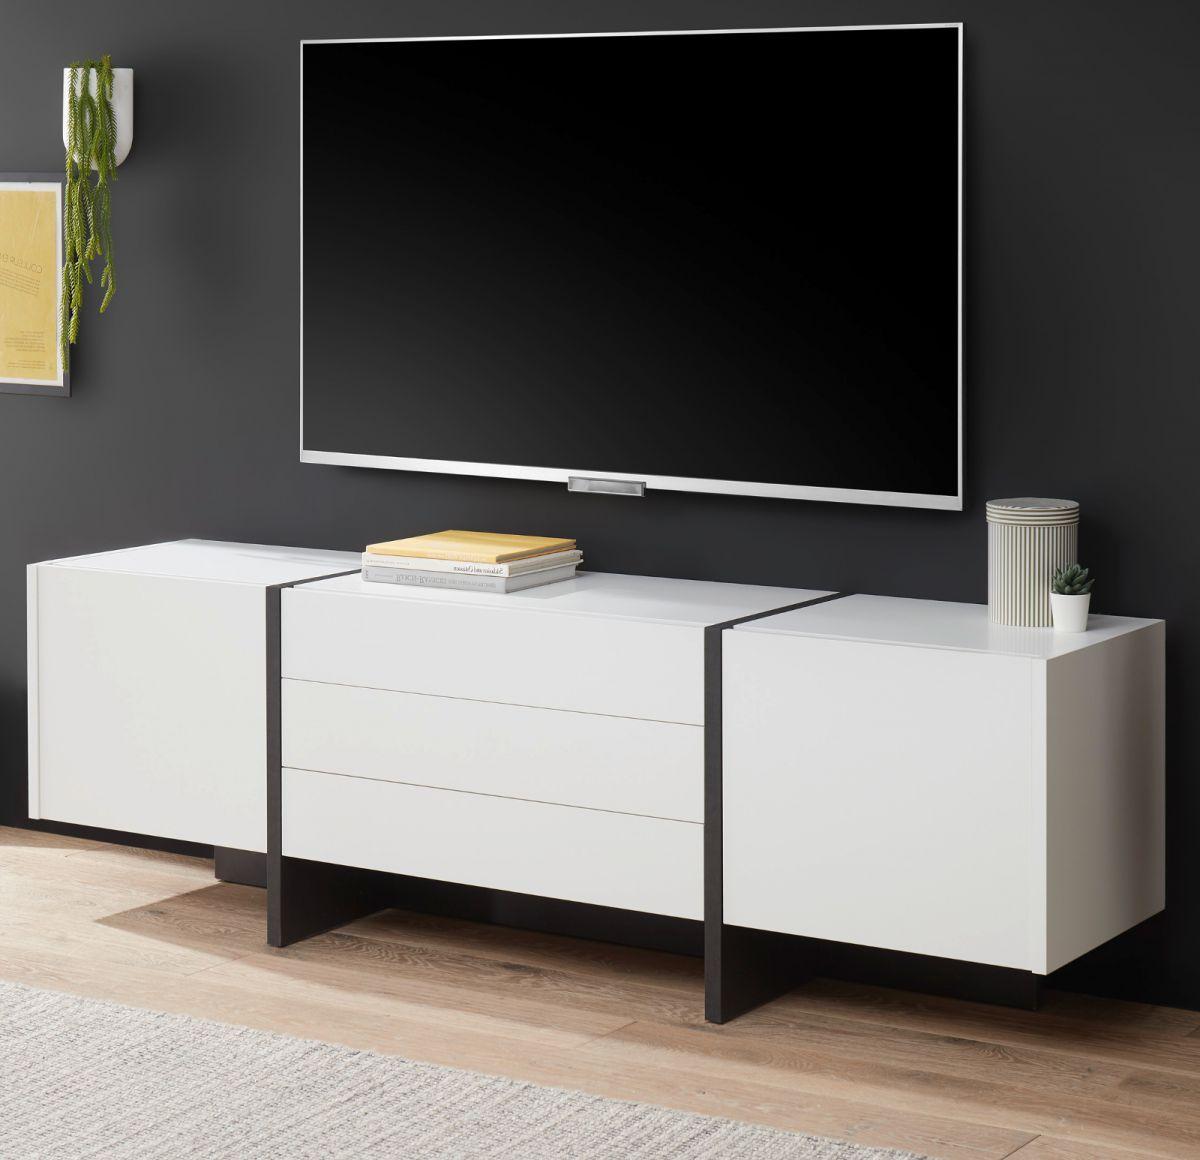 TV-Lowboard Design-M in weiss matt und Fresco grau 190 x 60 cm